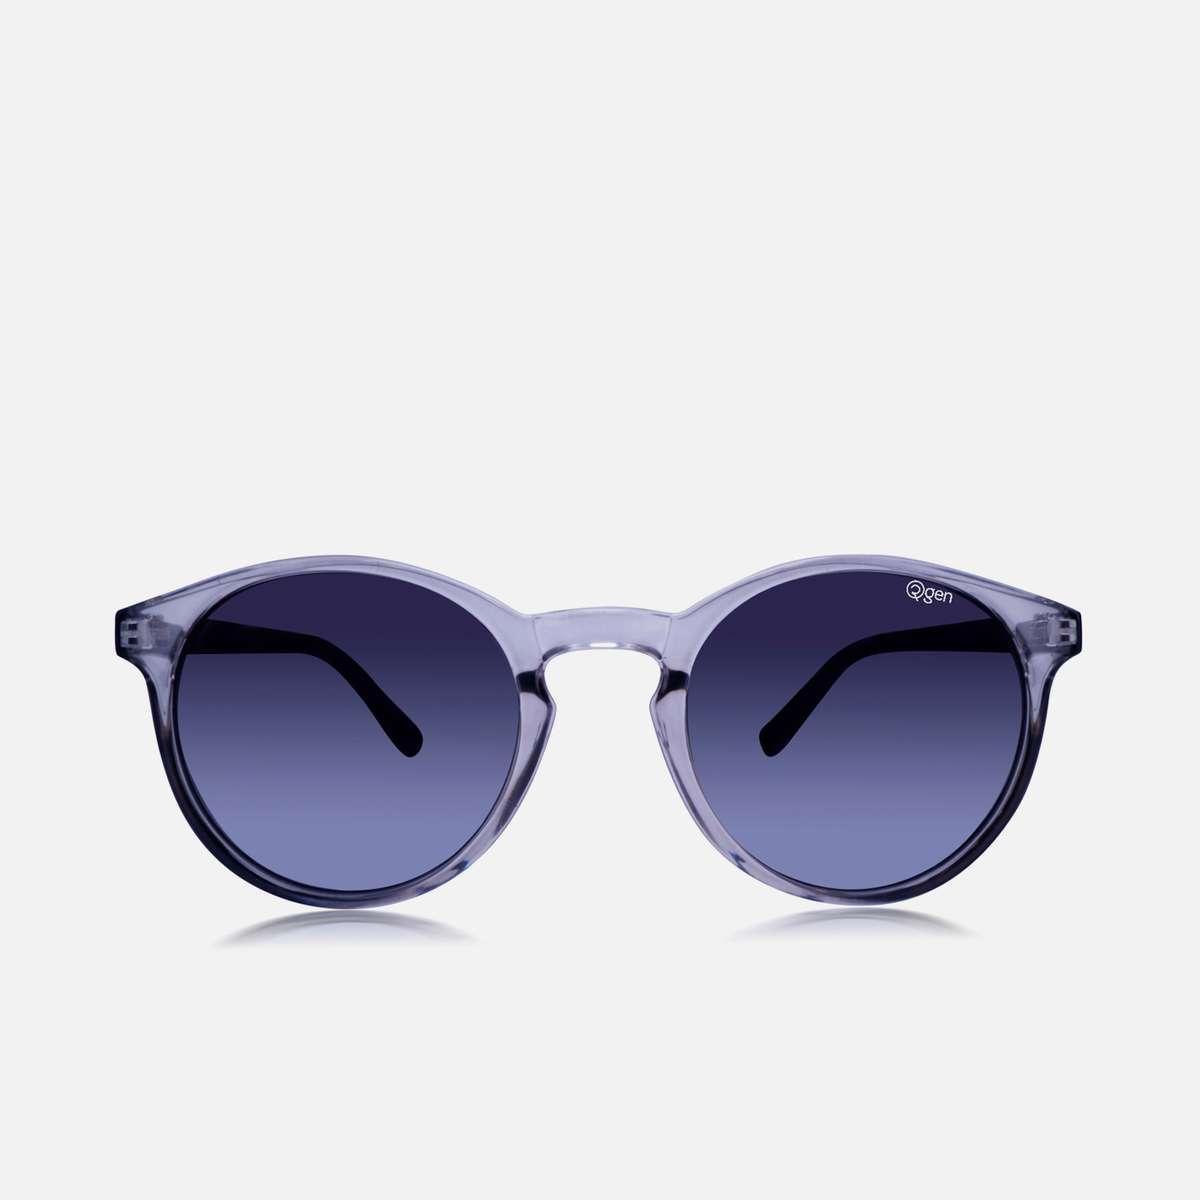 1.O2GEN Women Solid Round Sunglasses - O2-21-012-C4